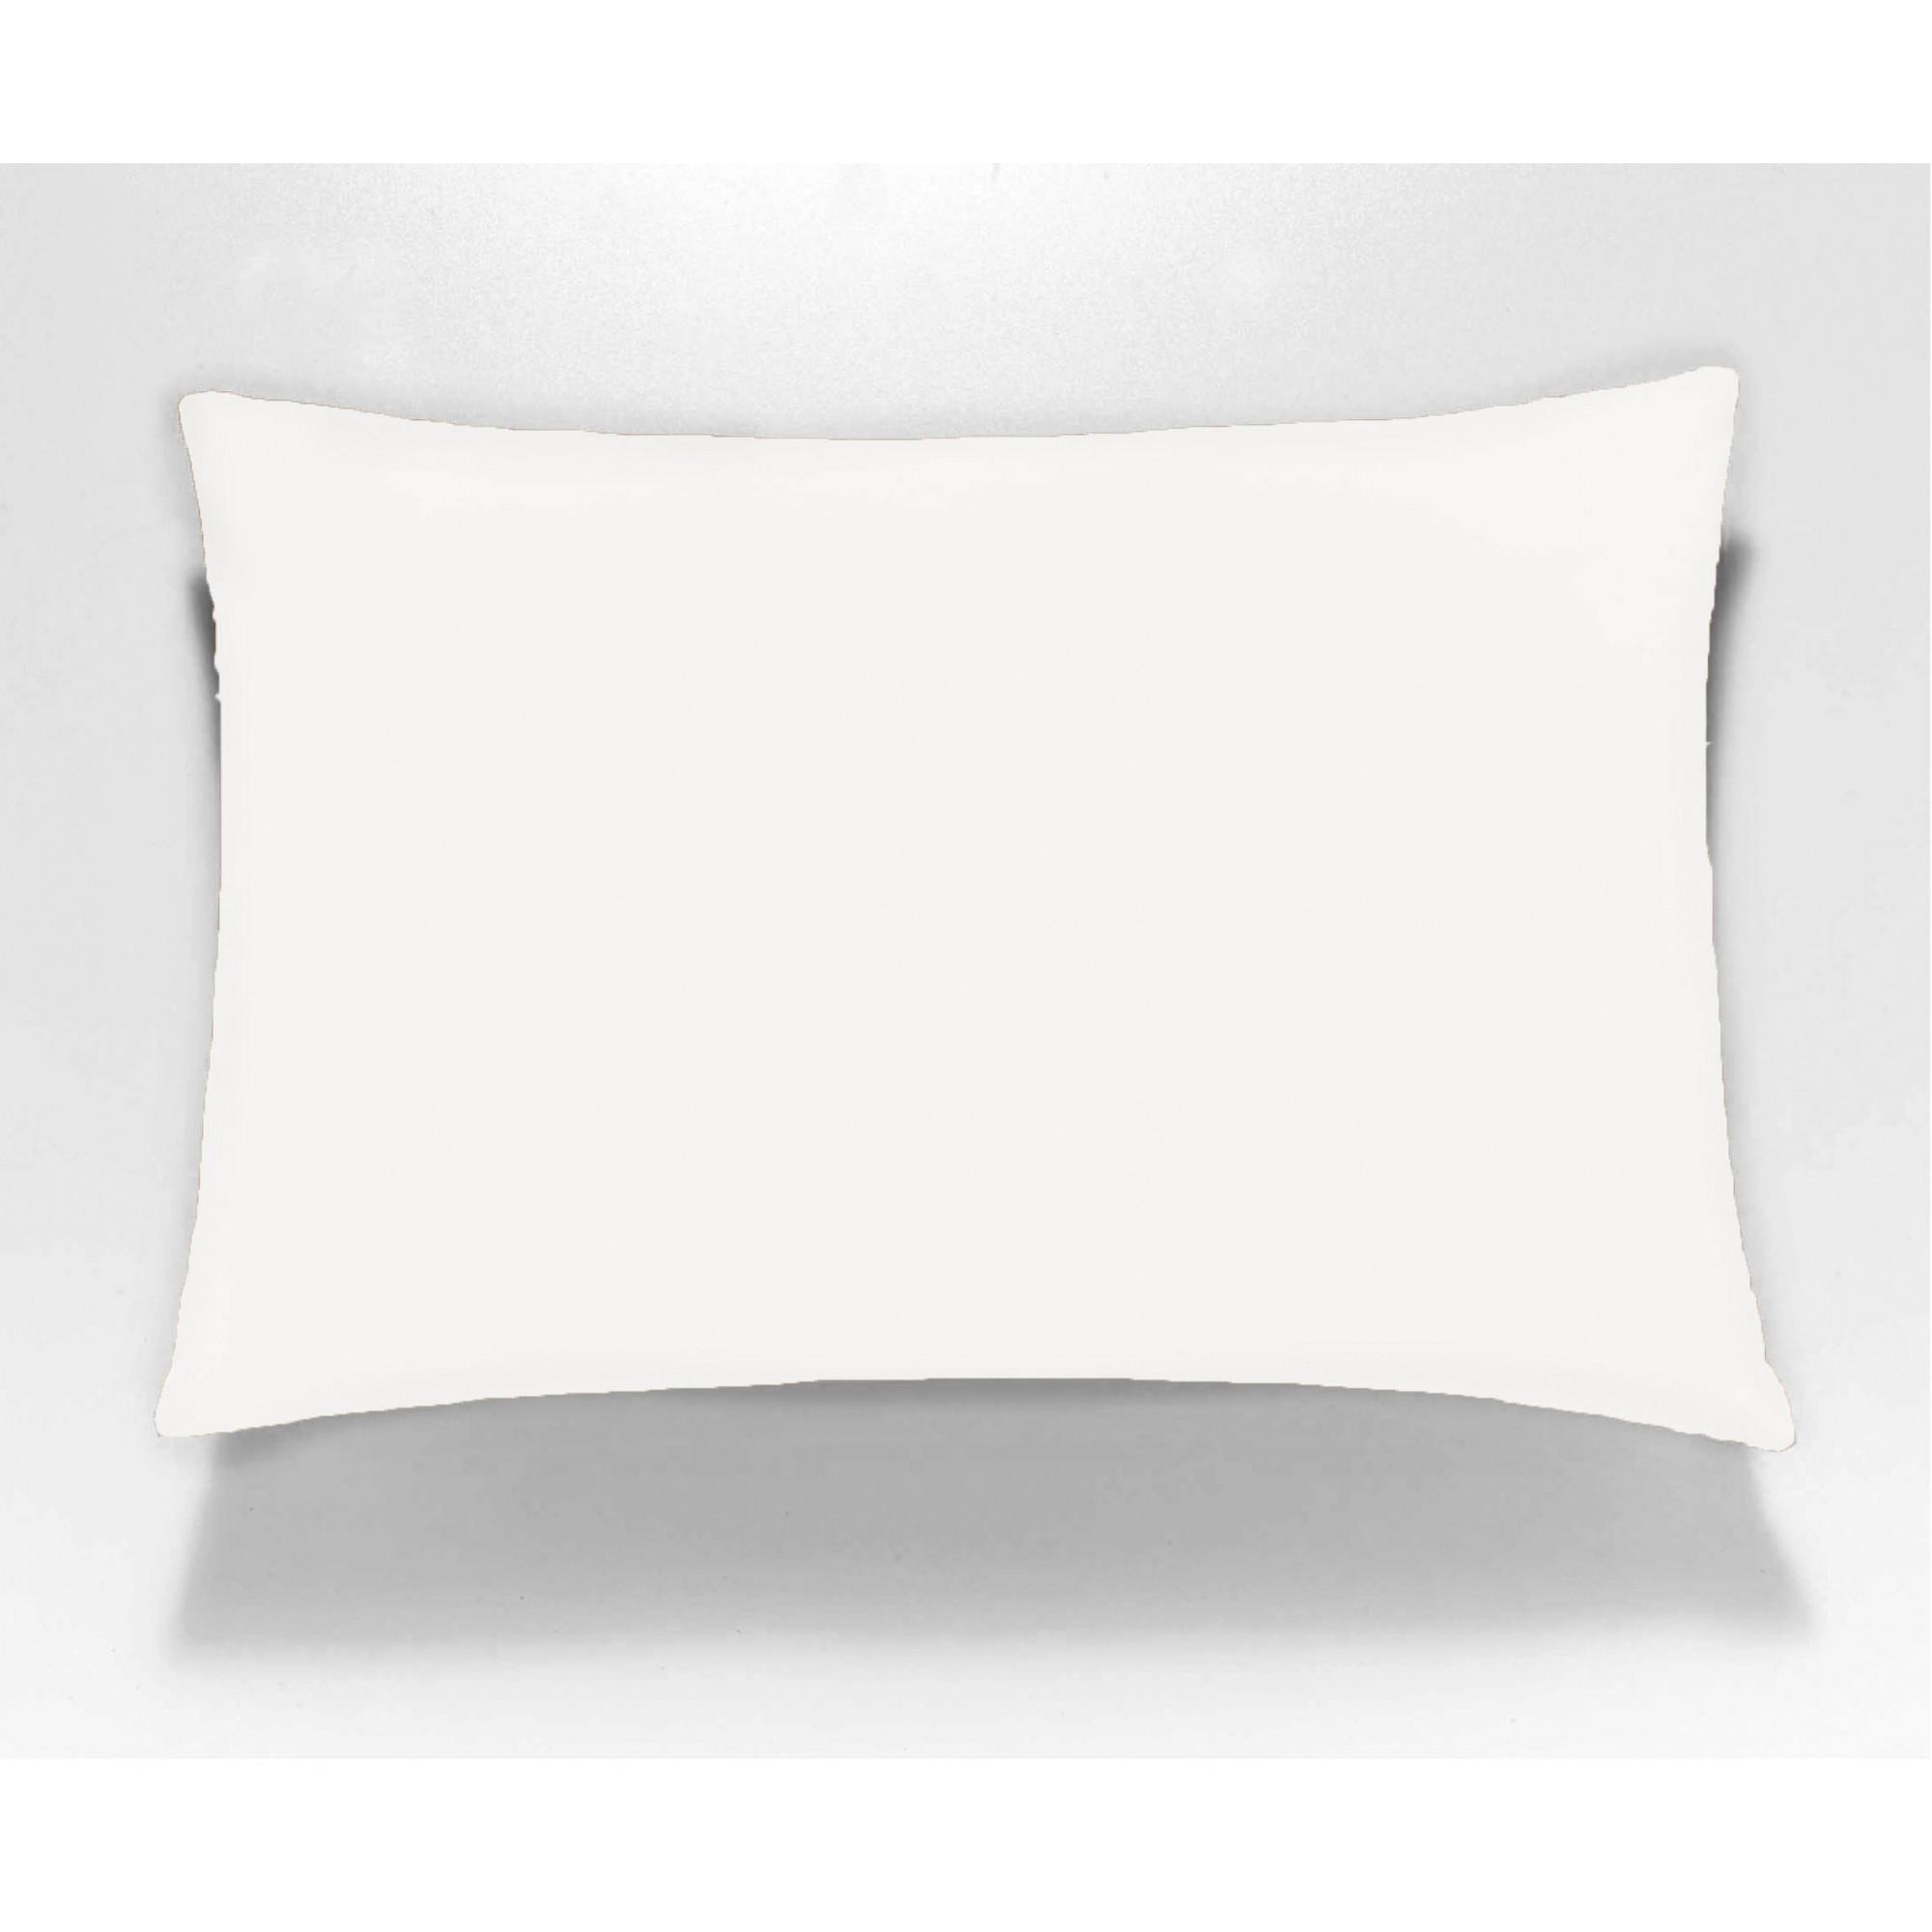 Fronha Avulsa - Royal - Branco 0001 - 100% Algodão - Santista